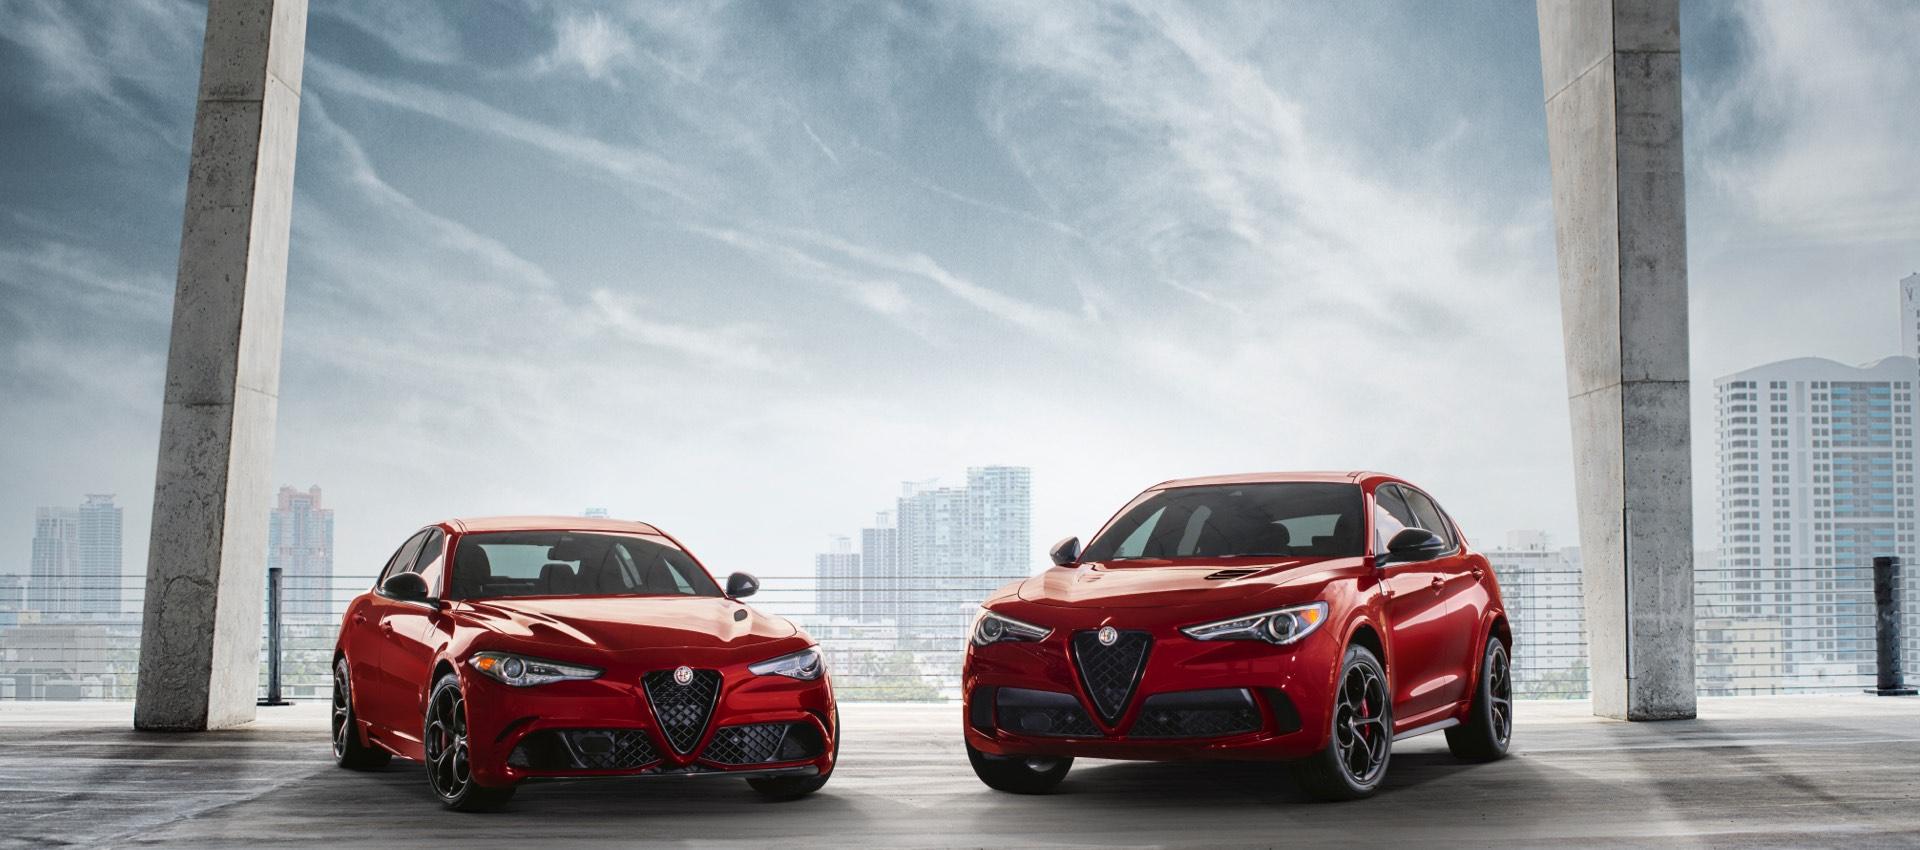 La línea Alfa Romeo, unGiulia Quadrifoglio rojo, un4C Spider blanco y unStelvio Quadrifoglio rojo estacionados en el techo de un garaje.